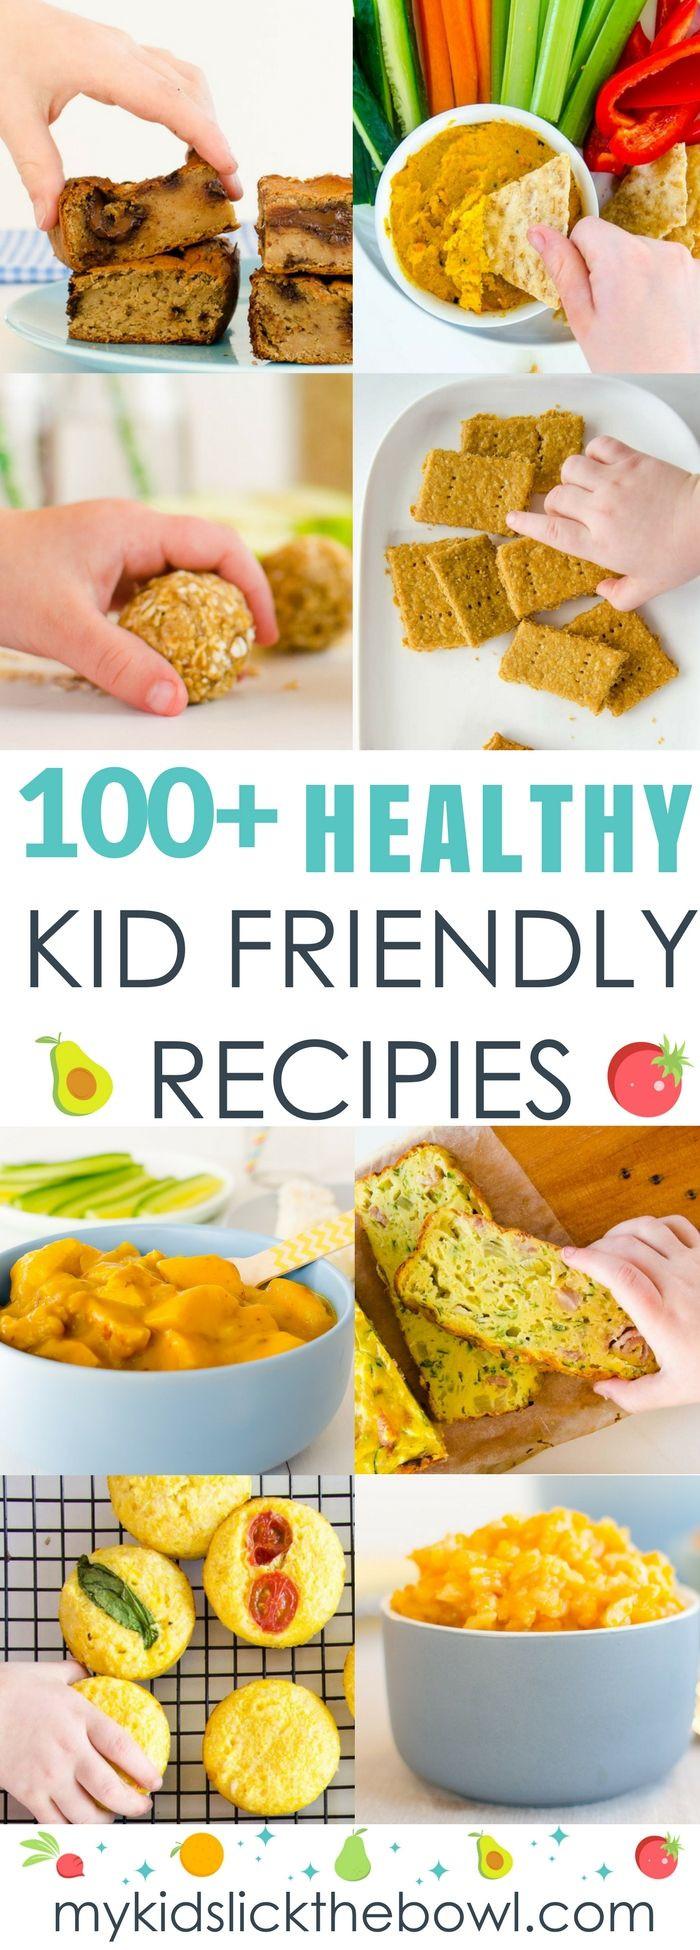 Kid Friendly Healthy Recipes  De 25 bedste idéer inden for Healthy kid friendly recipes